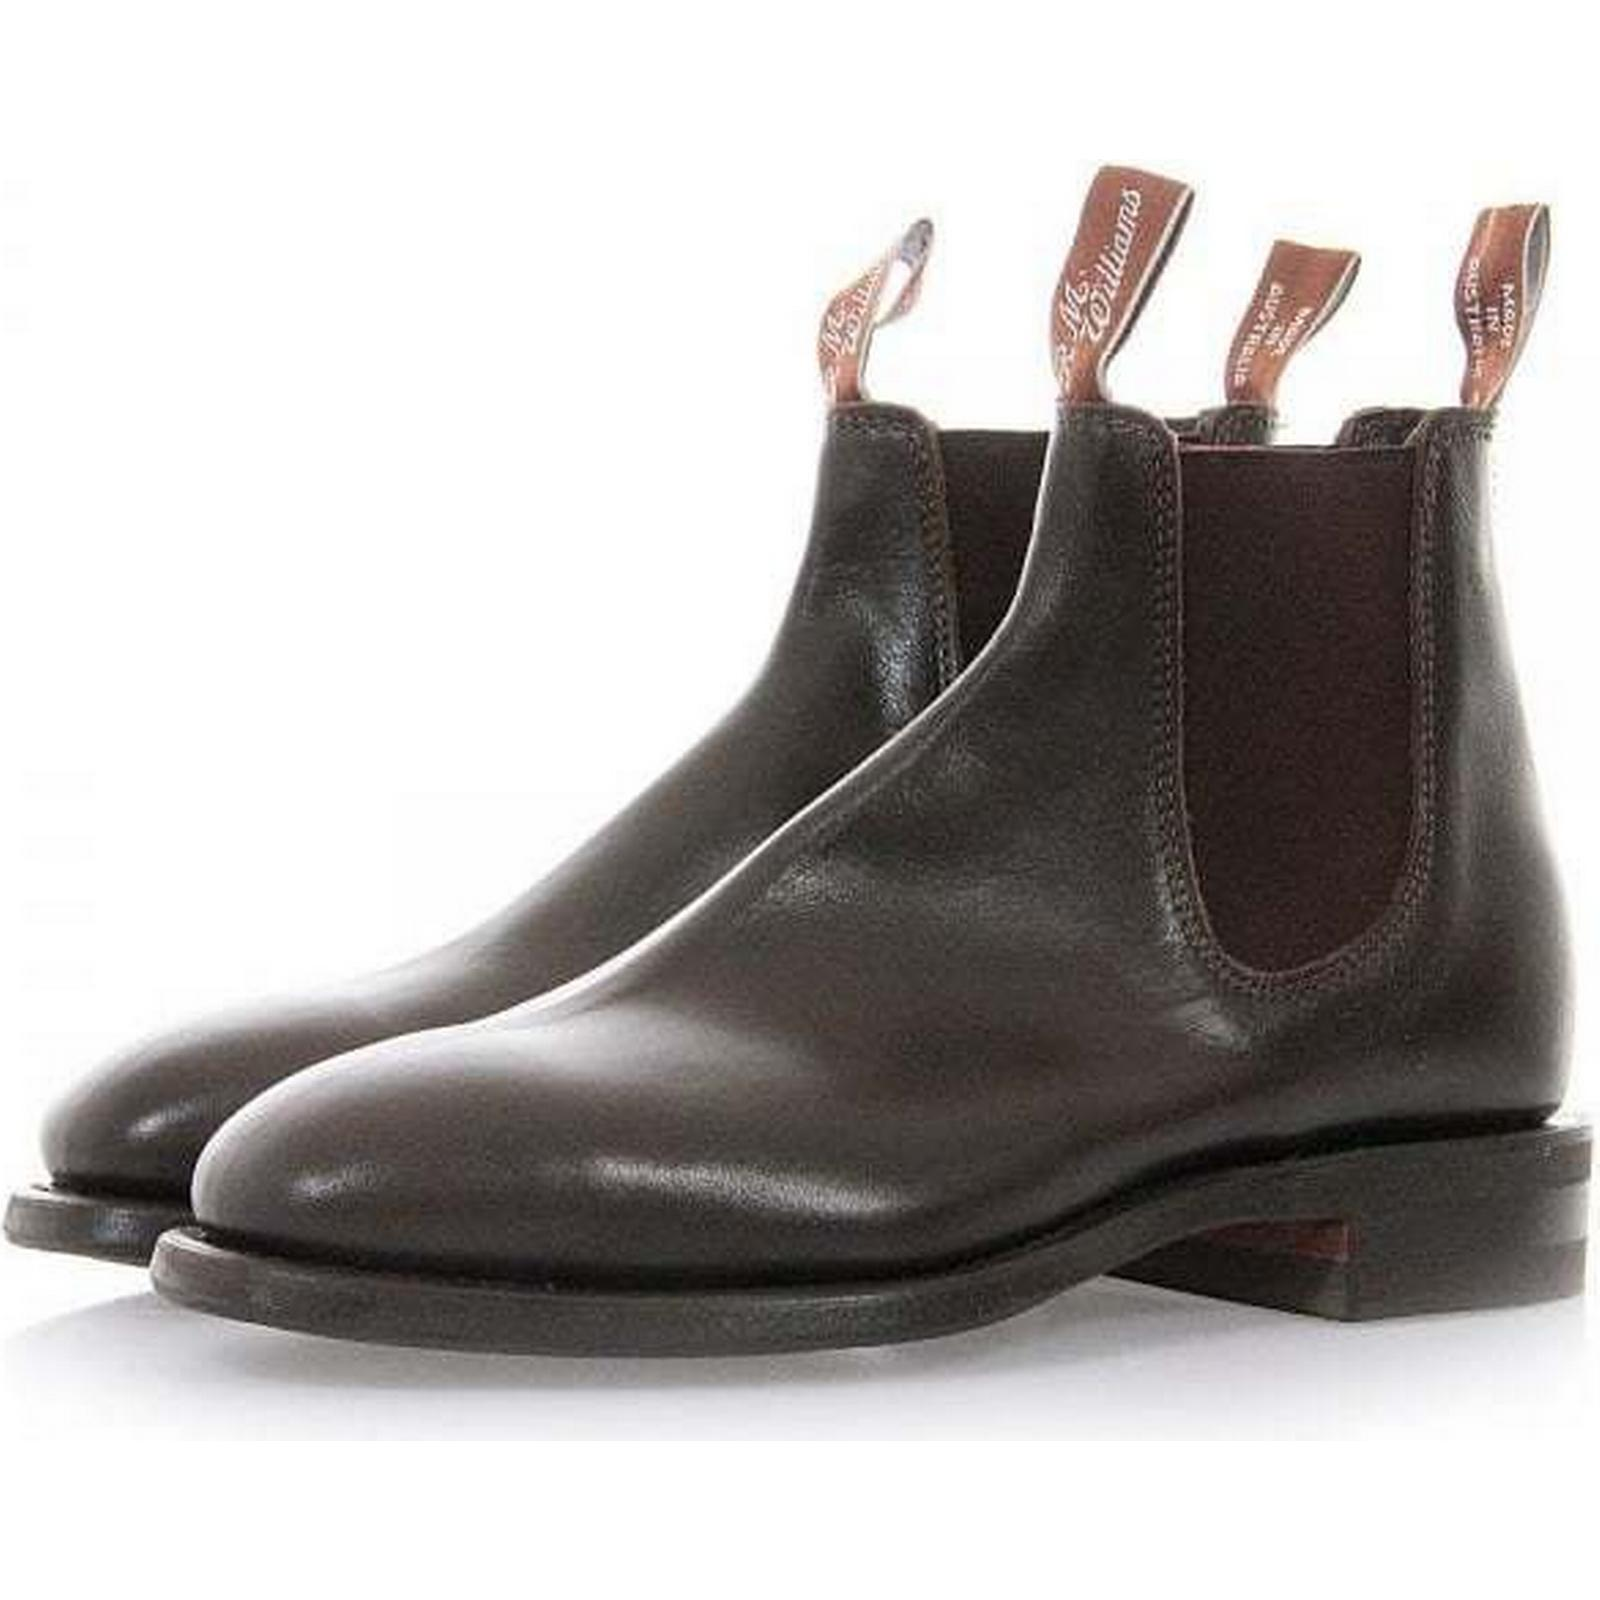 32707 R.M Leather Williams Comfort Craftsman Chestnut Leather R.M Chelsea Boots B543Y de8d53